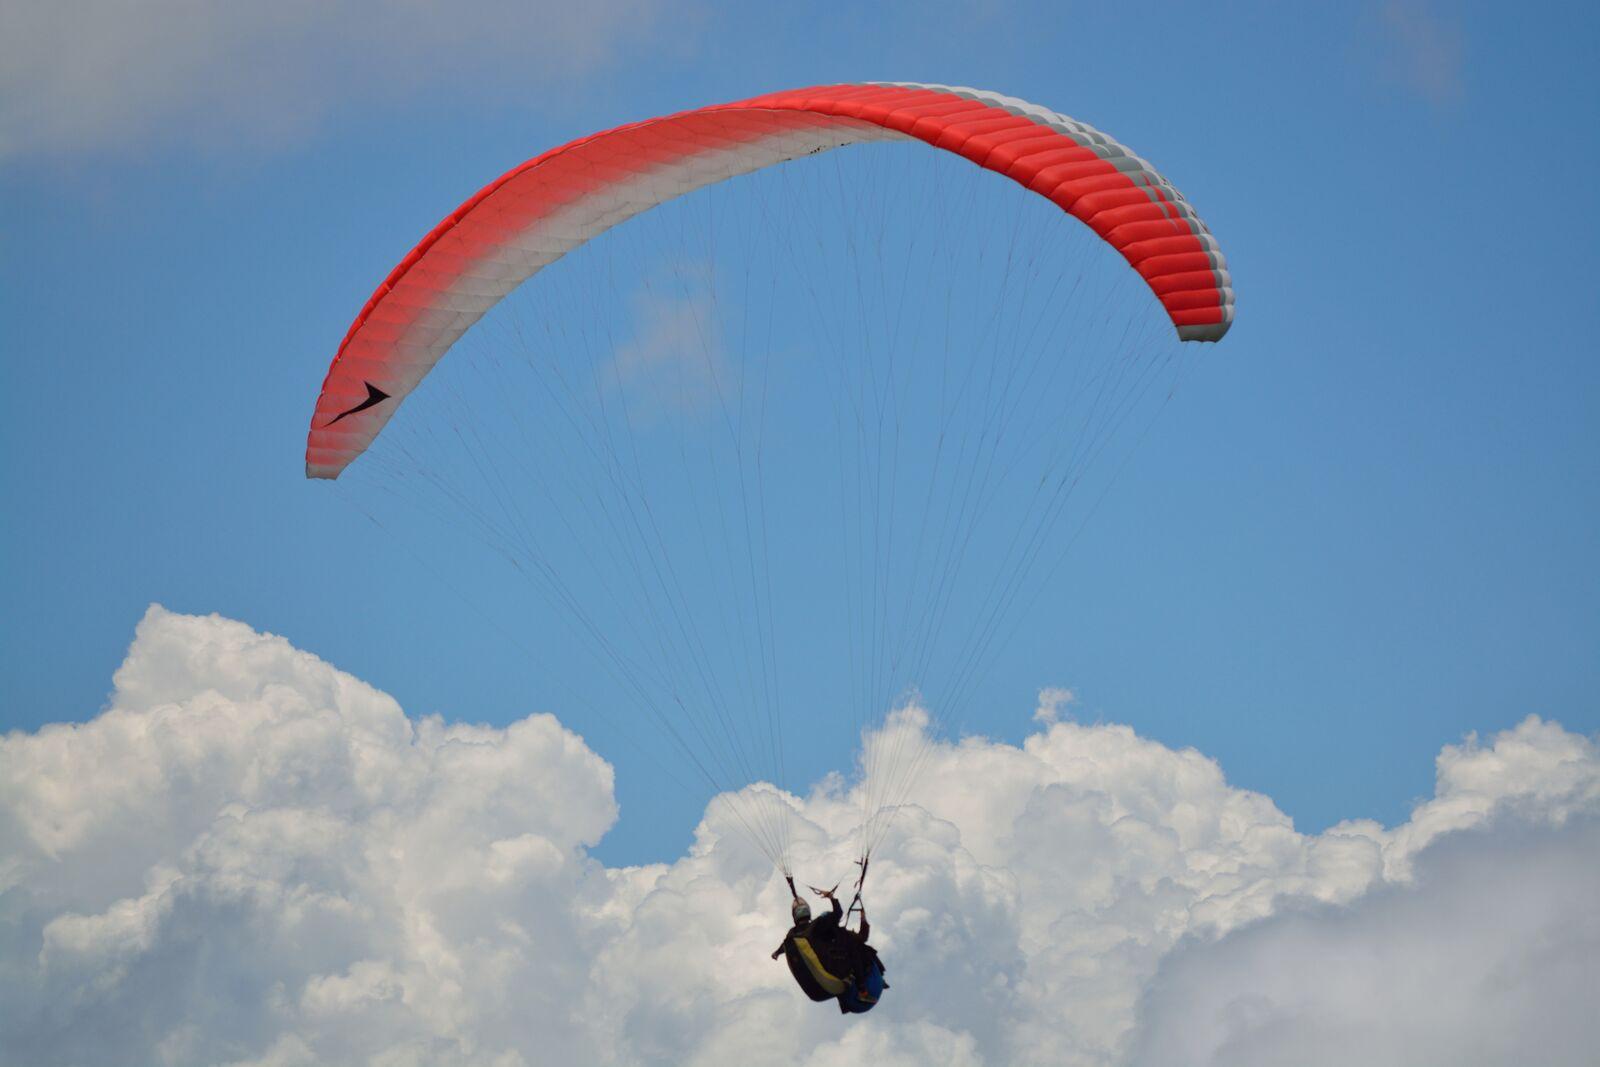 Wild Sky Paragliding